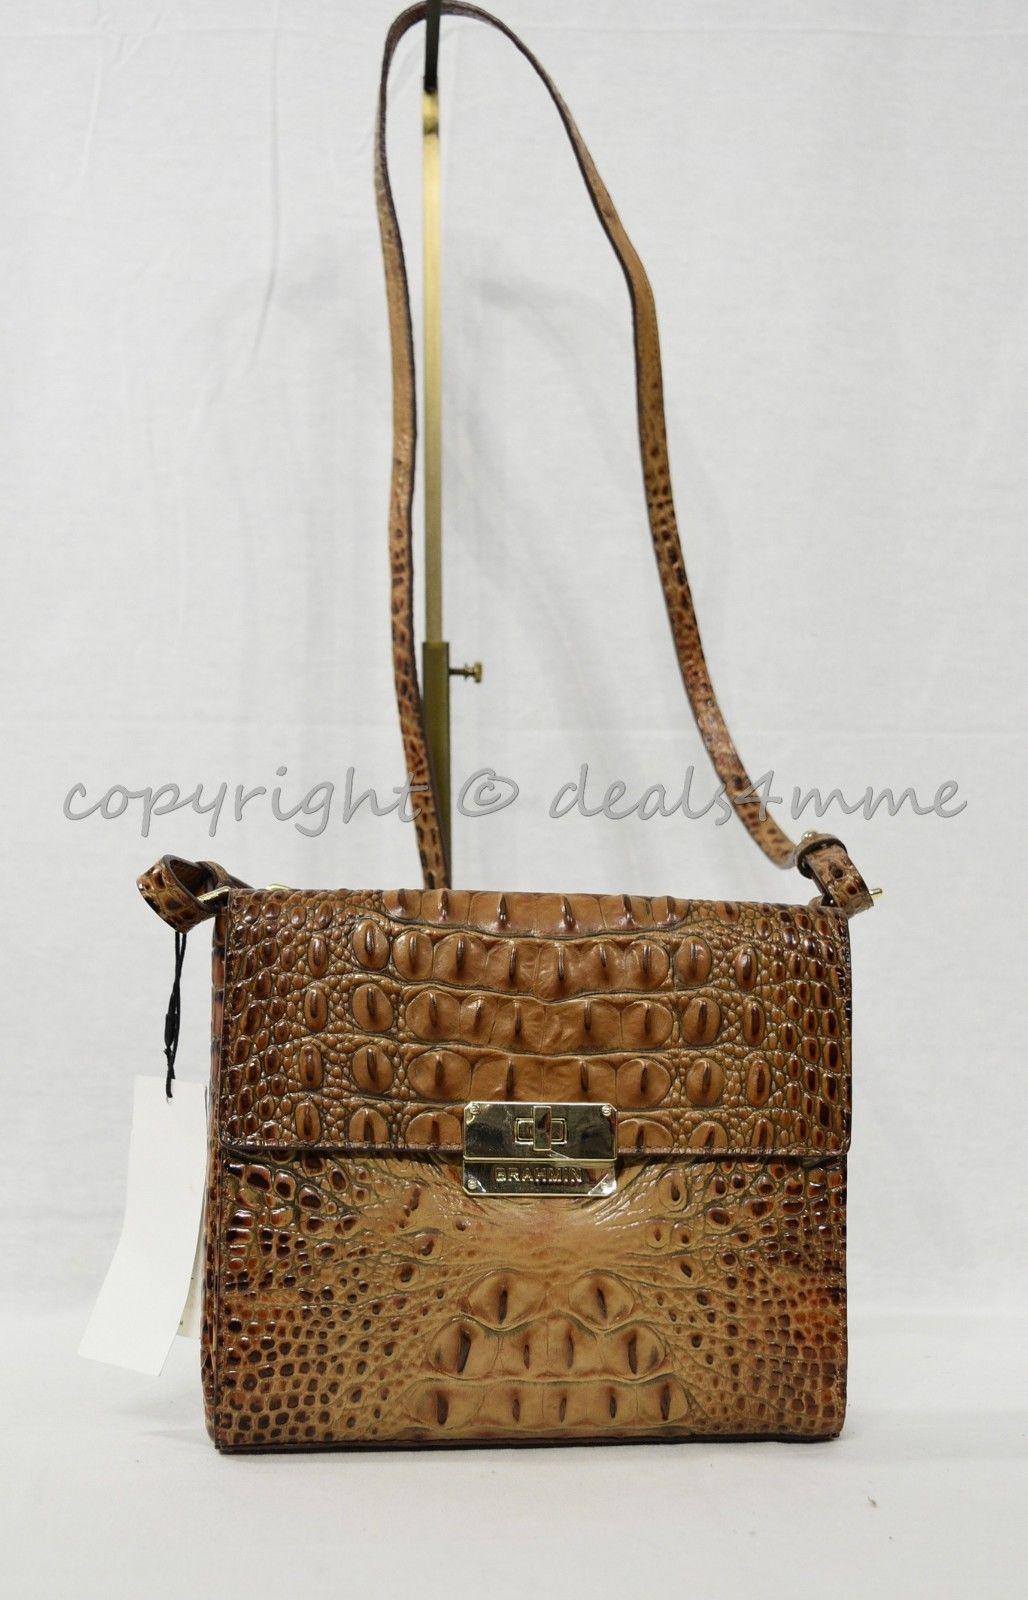 NWT Brahmin Manhattan Leather Shoulder/Crossbody Bag in Toasted Almond Melbourne image 2